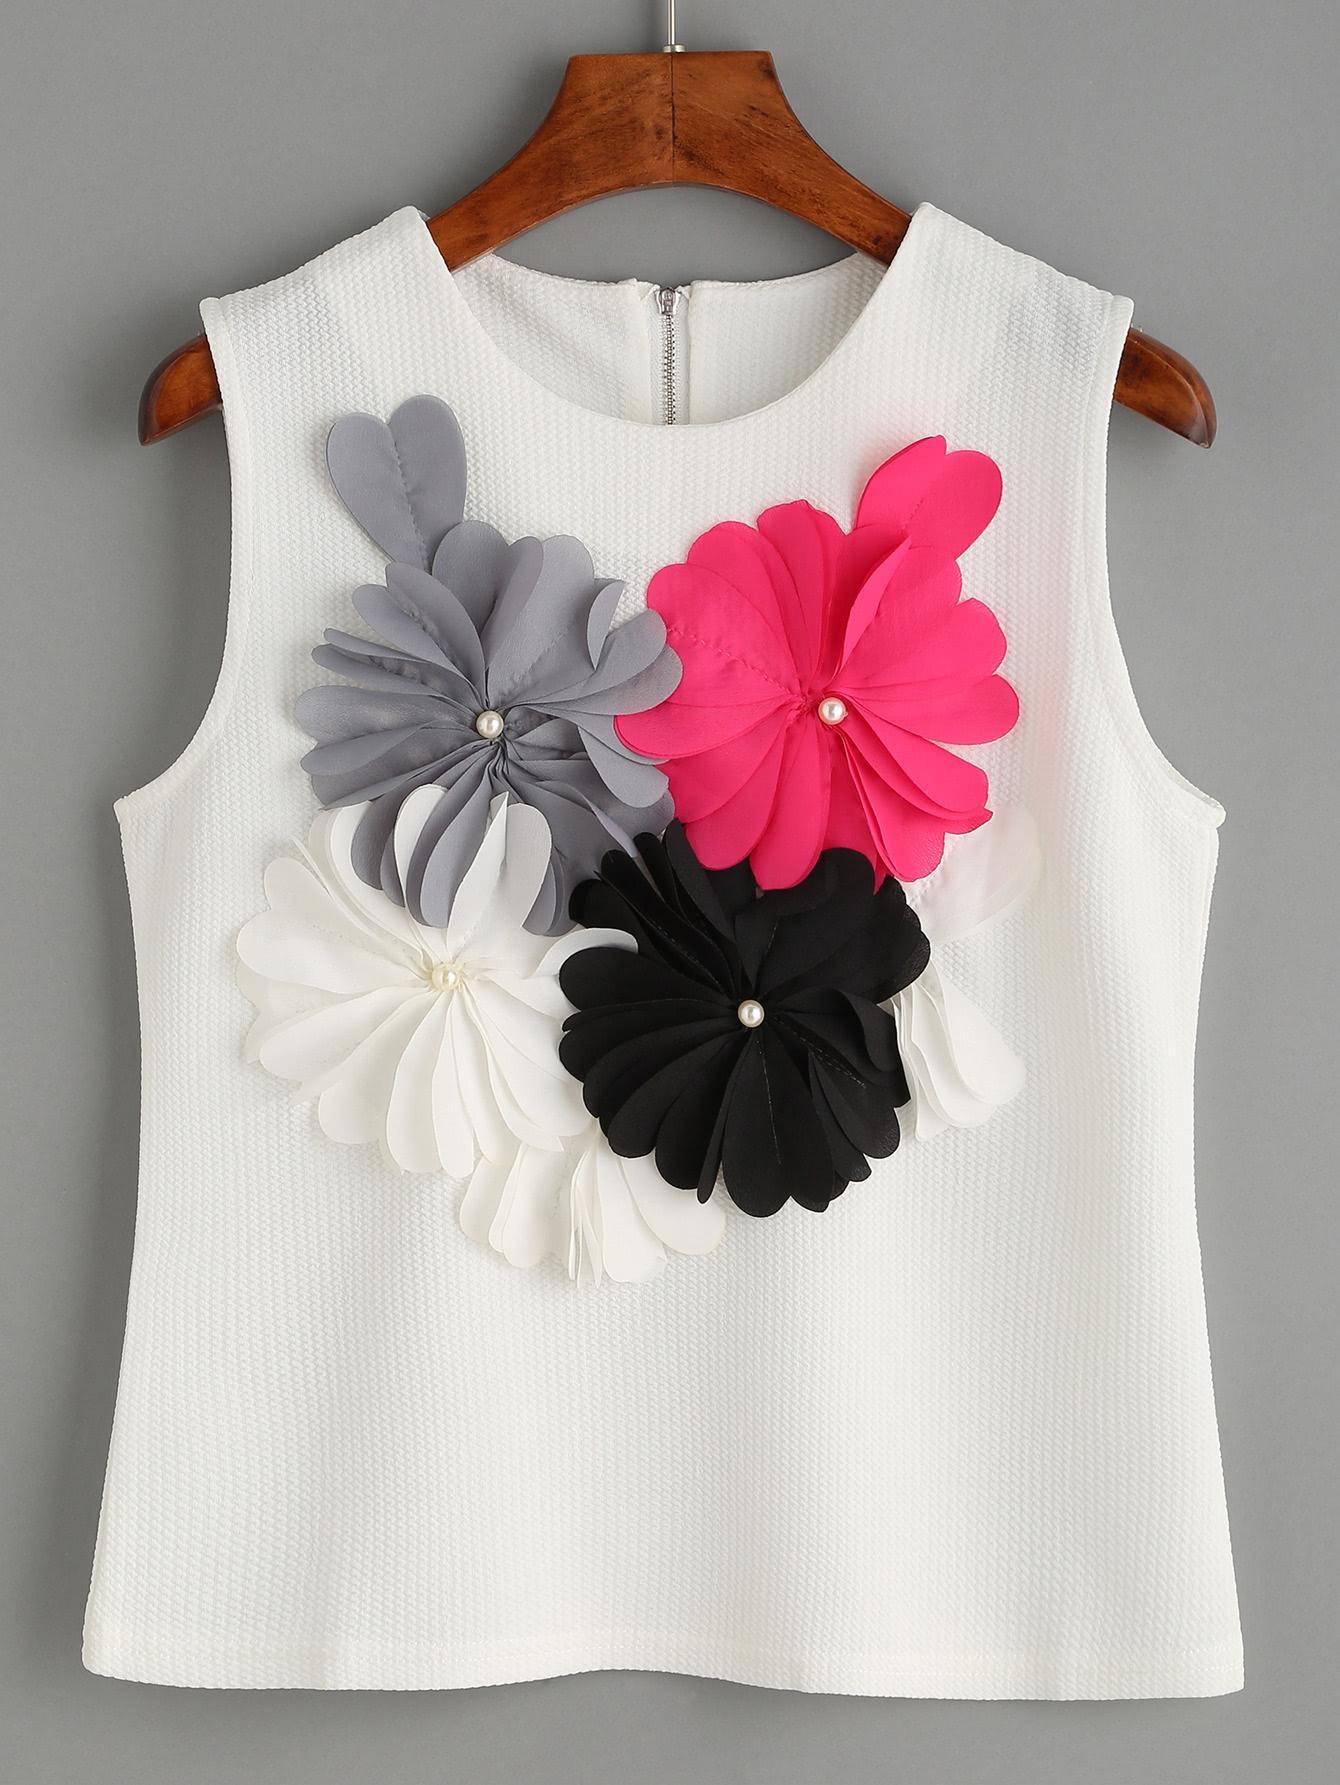 White Flower Applique Sleeveless Textured TopWhite Flower Applique Sleeveless Textured Top<br><br>color: White<br>size: L,M